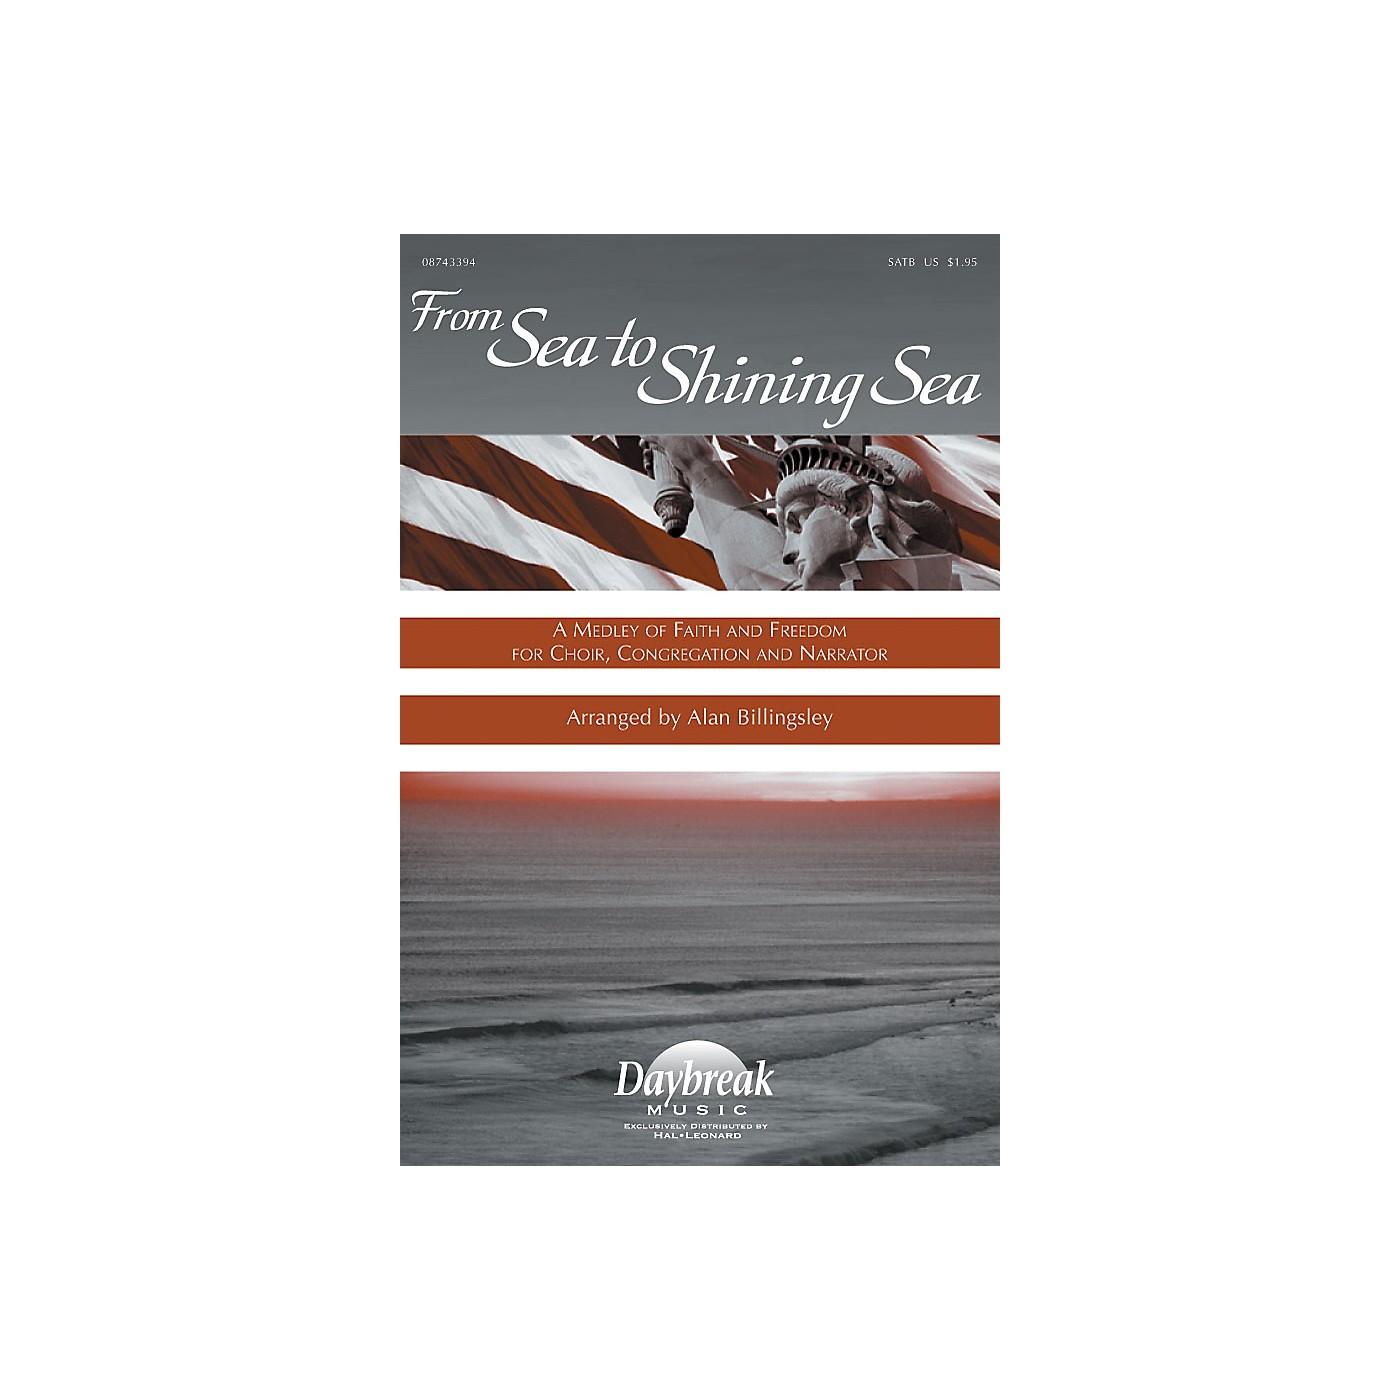 Hal Leonard From Sea to Shining Sea (A Medley of Faith and Freedom for Choir) SATB arranged by Alan Billingsley thumbnail